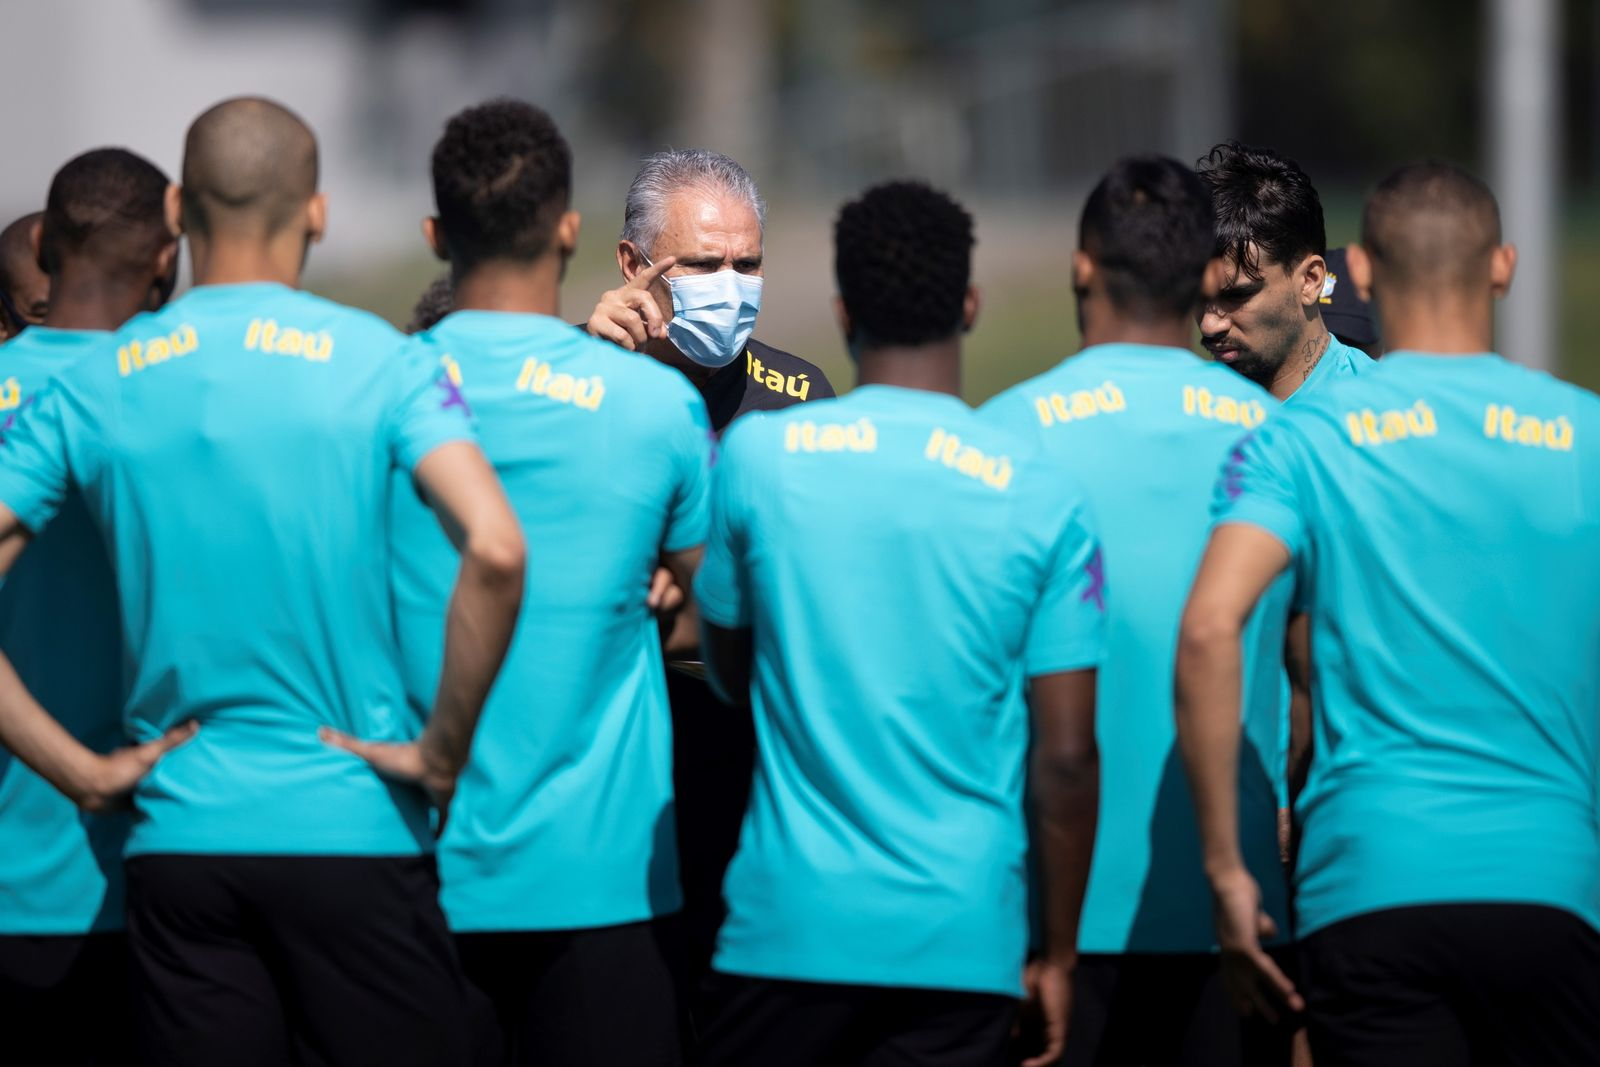 Brazil trains ahead of Paraguay, Ecuador clash qualifiers for Qatar 2022